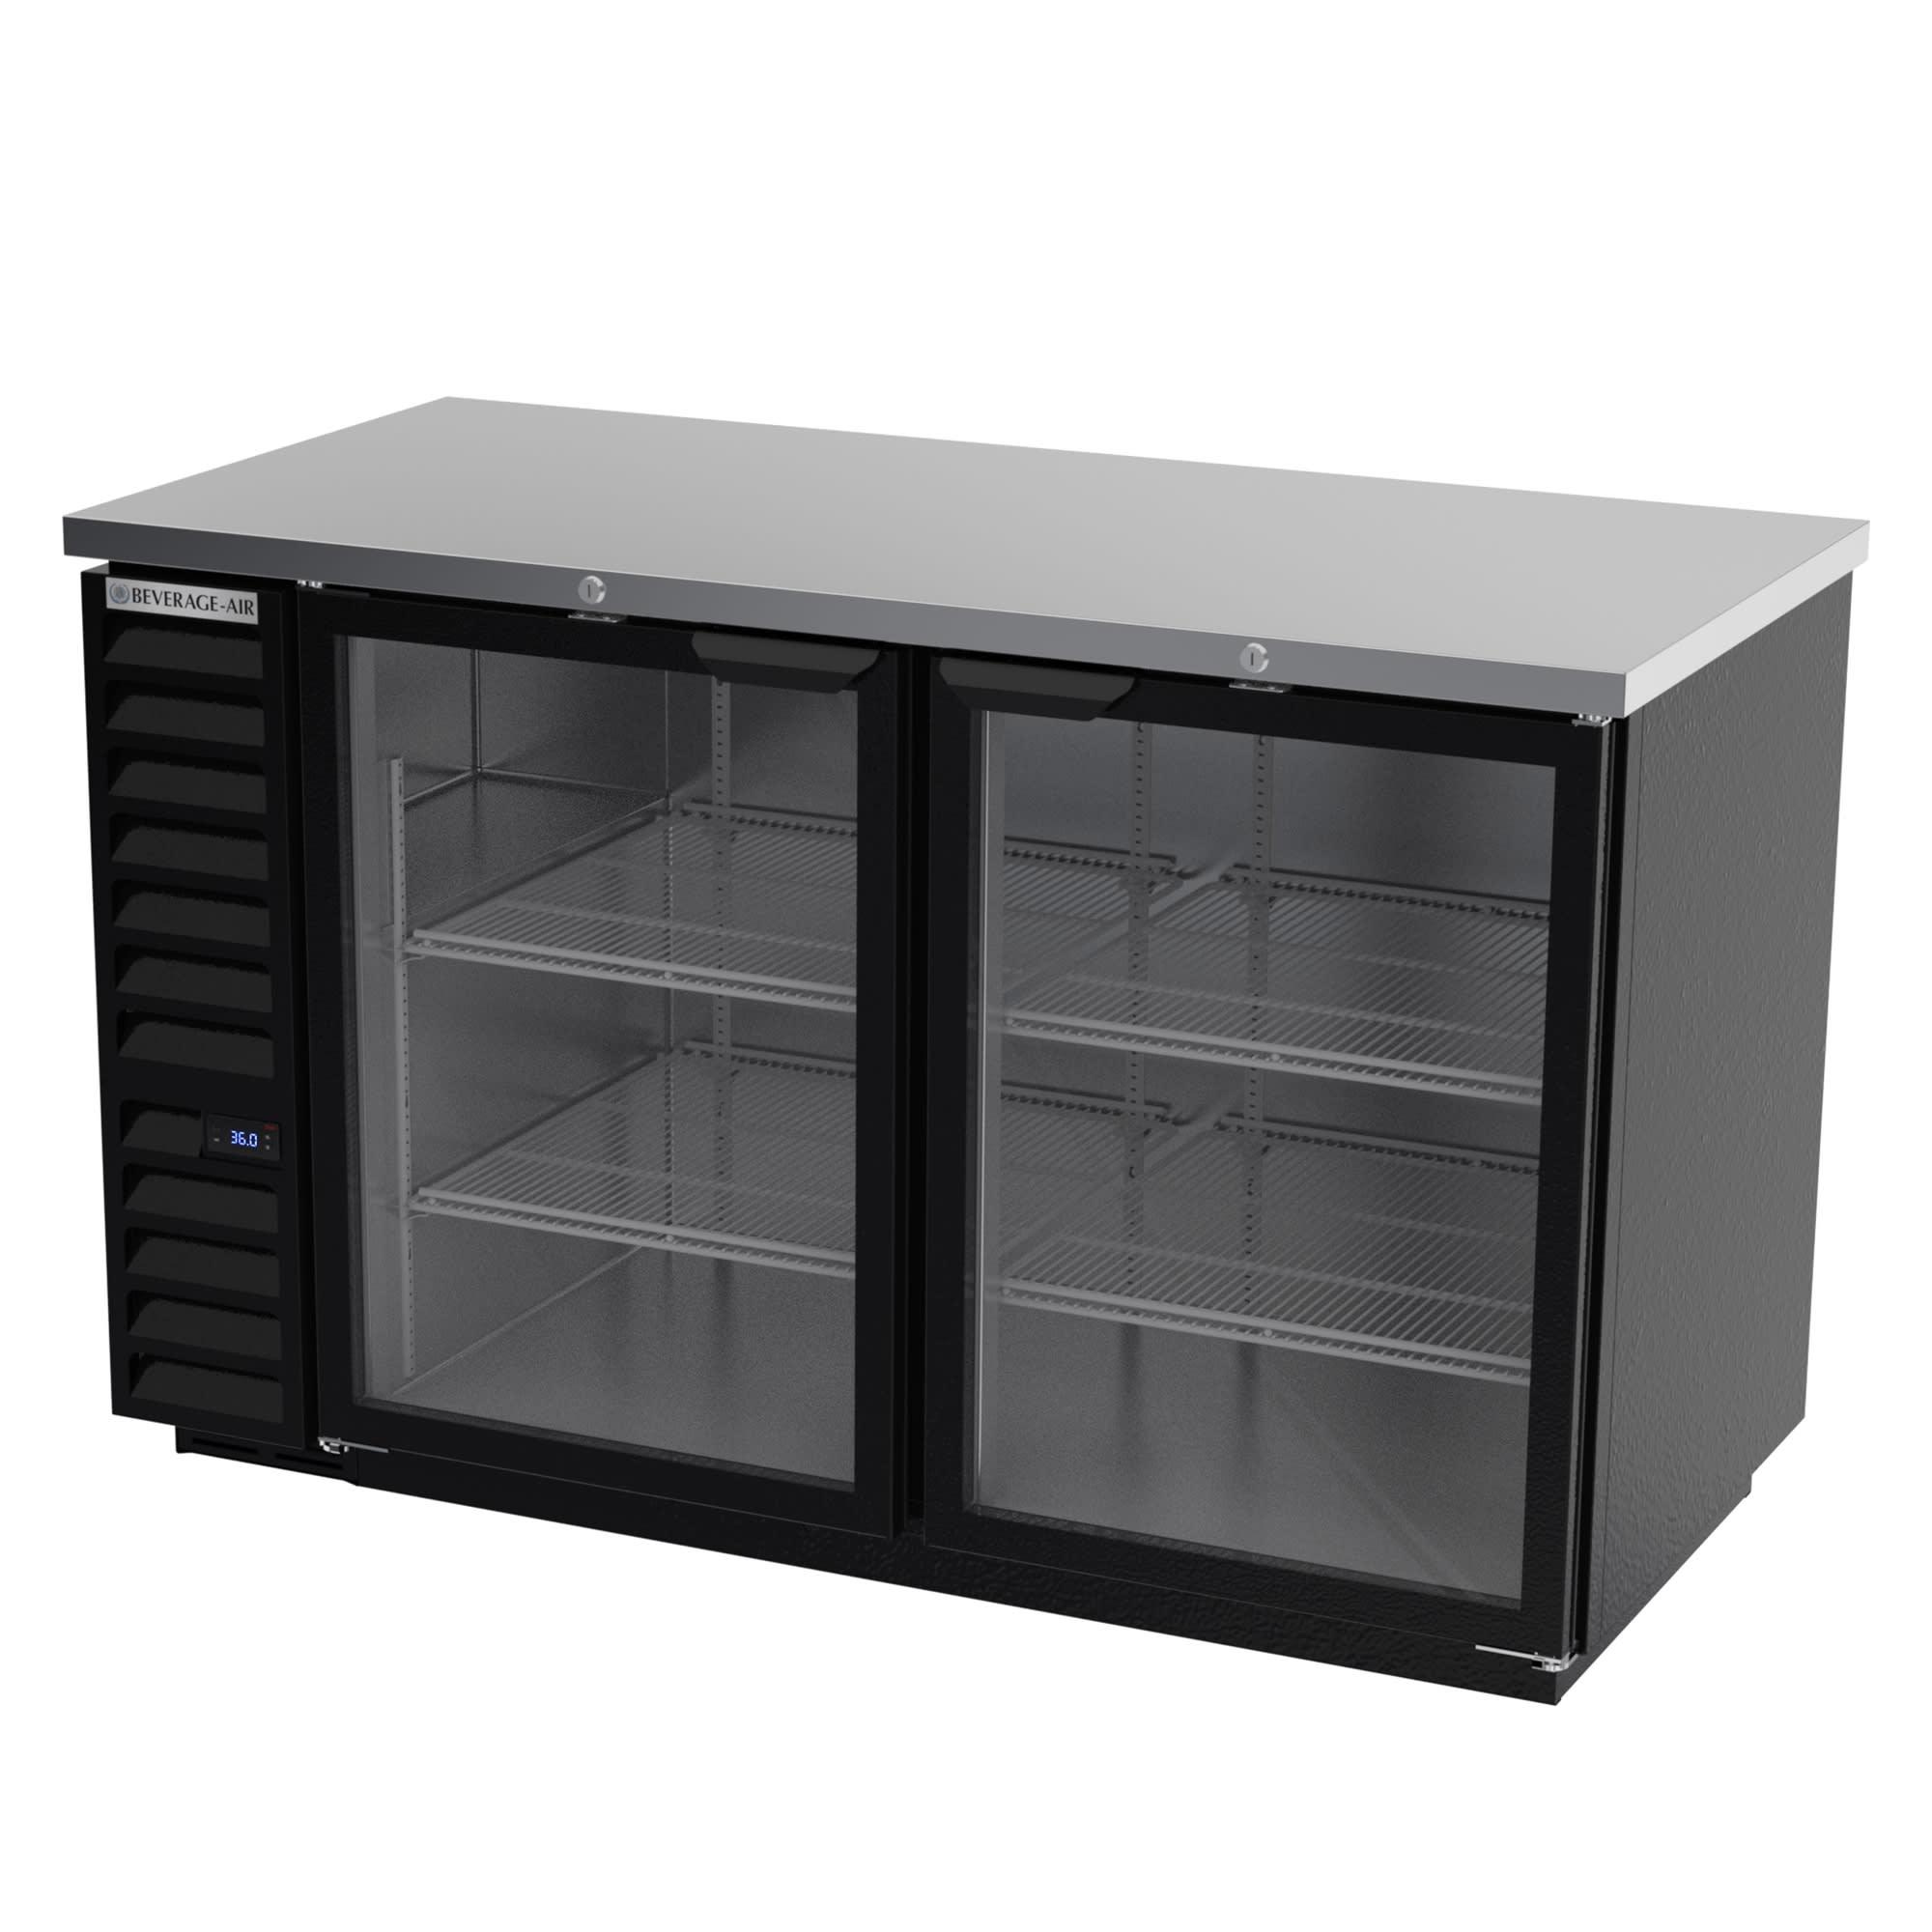 "Beverage Air BB58HC-1-G-B 59"" (2) Section Bar Refrigerator - Swinging Glass Door, 115v"